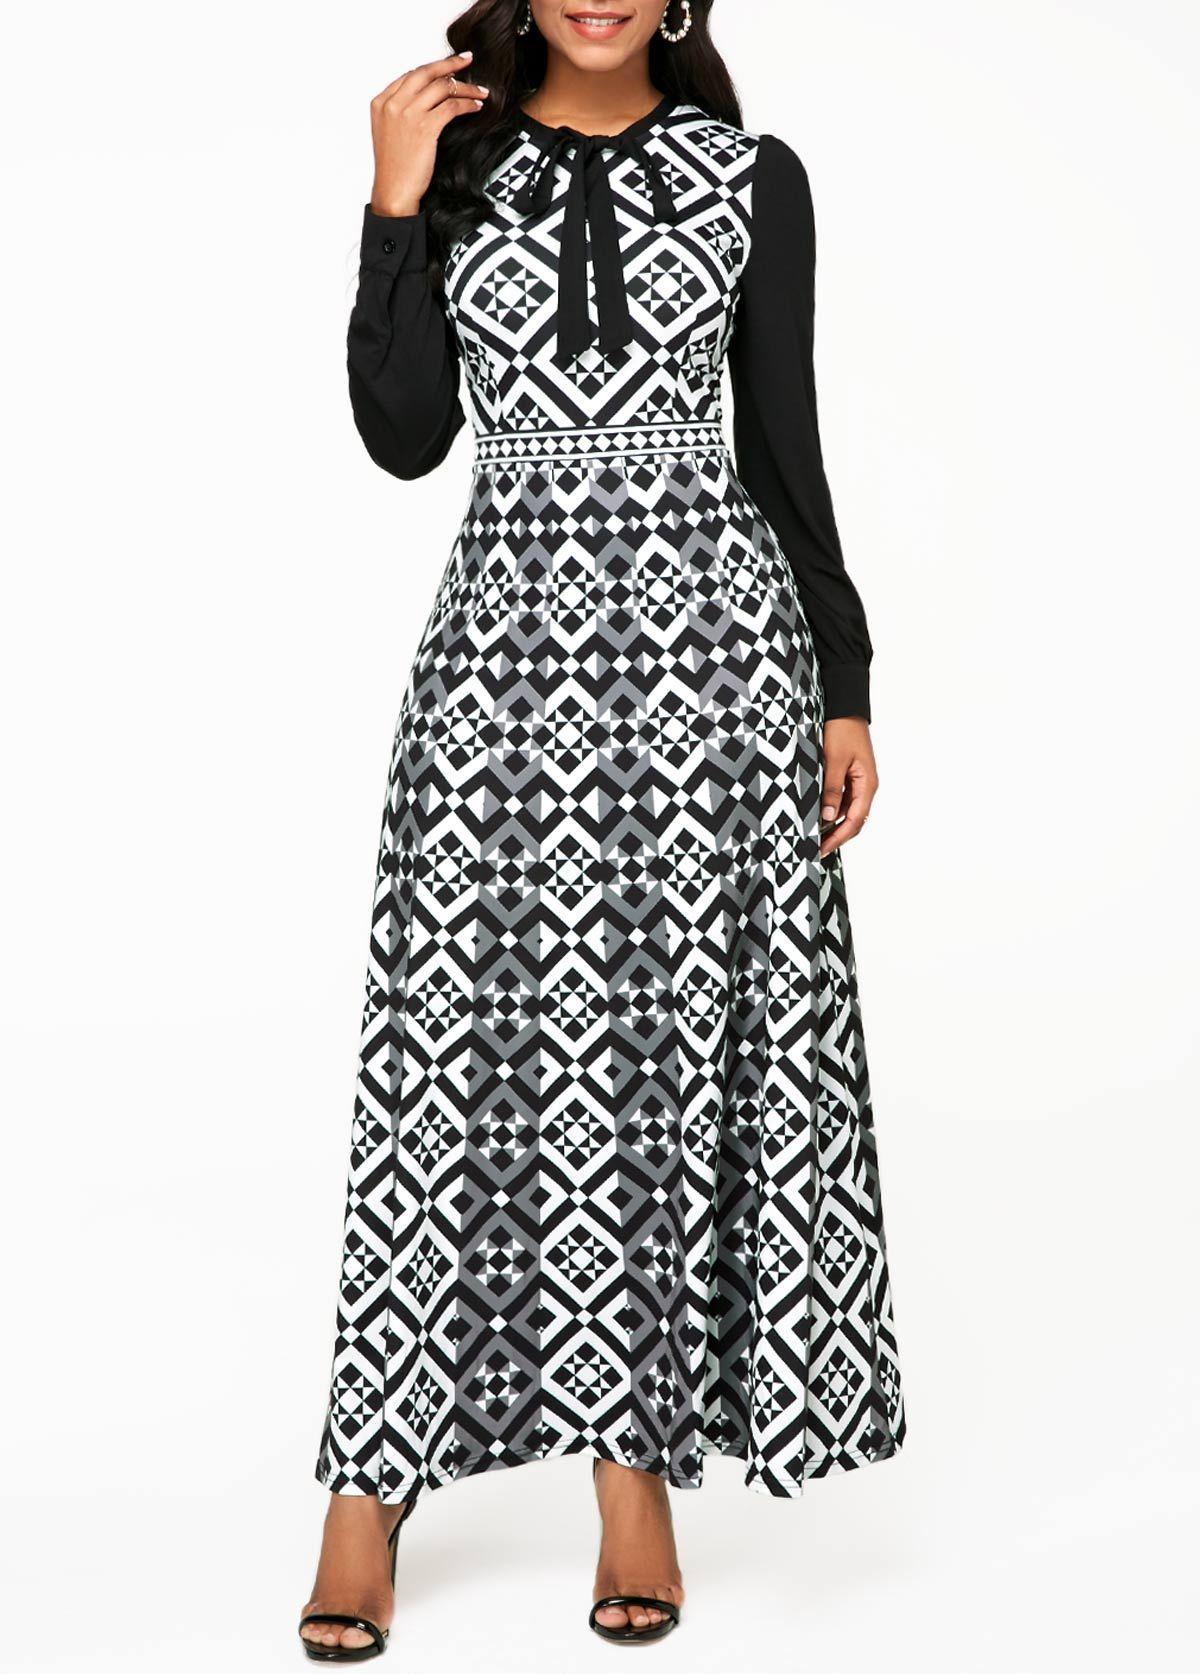 Geometric print bowknot detail long sleeve maxi dress dress styles